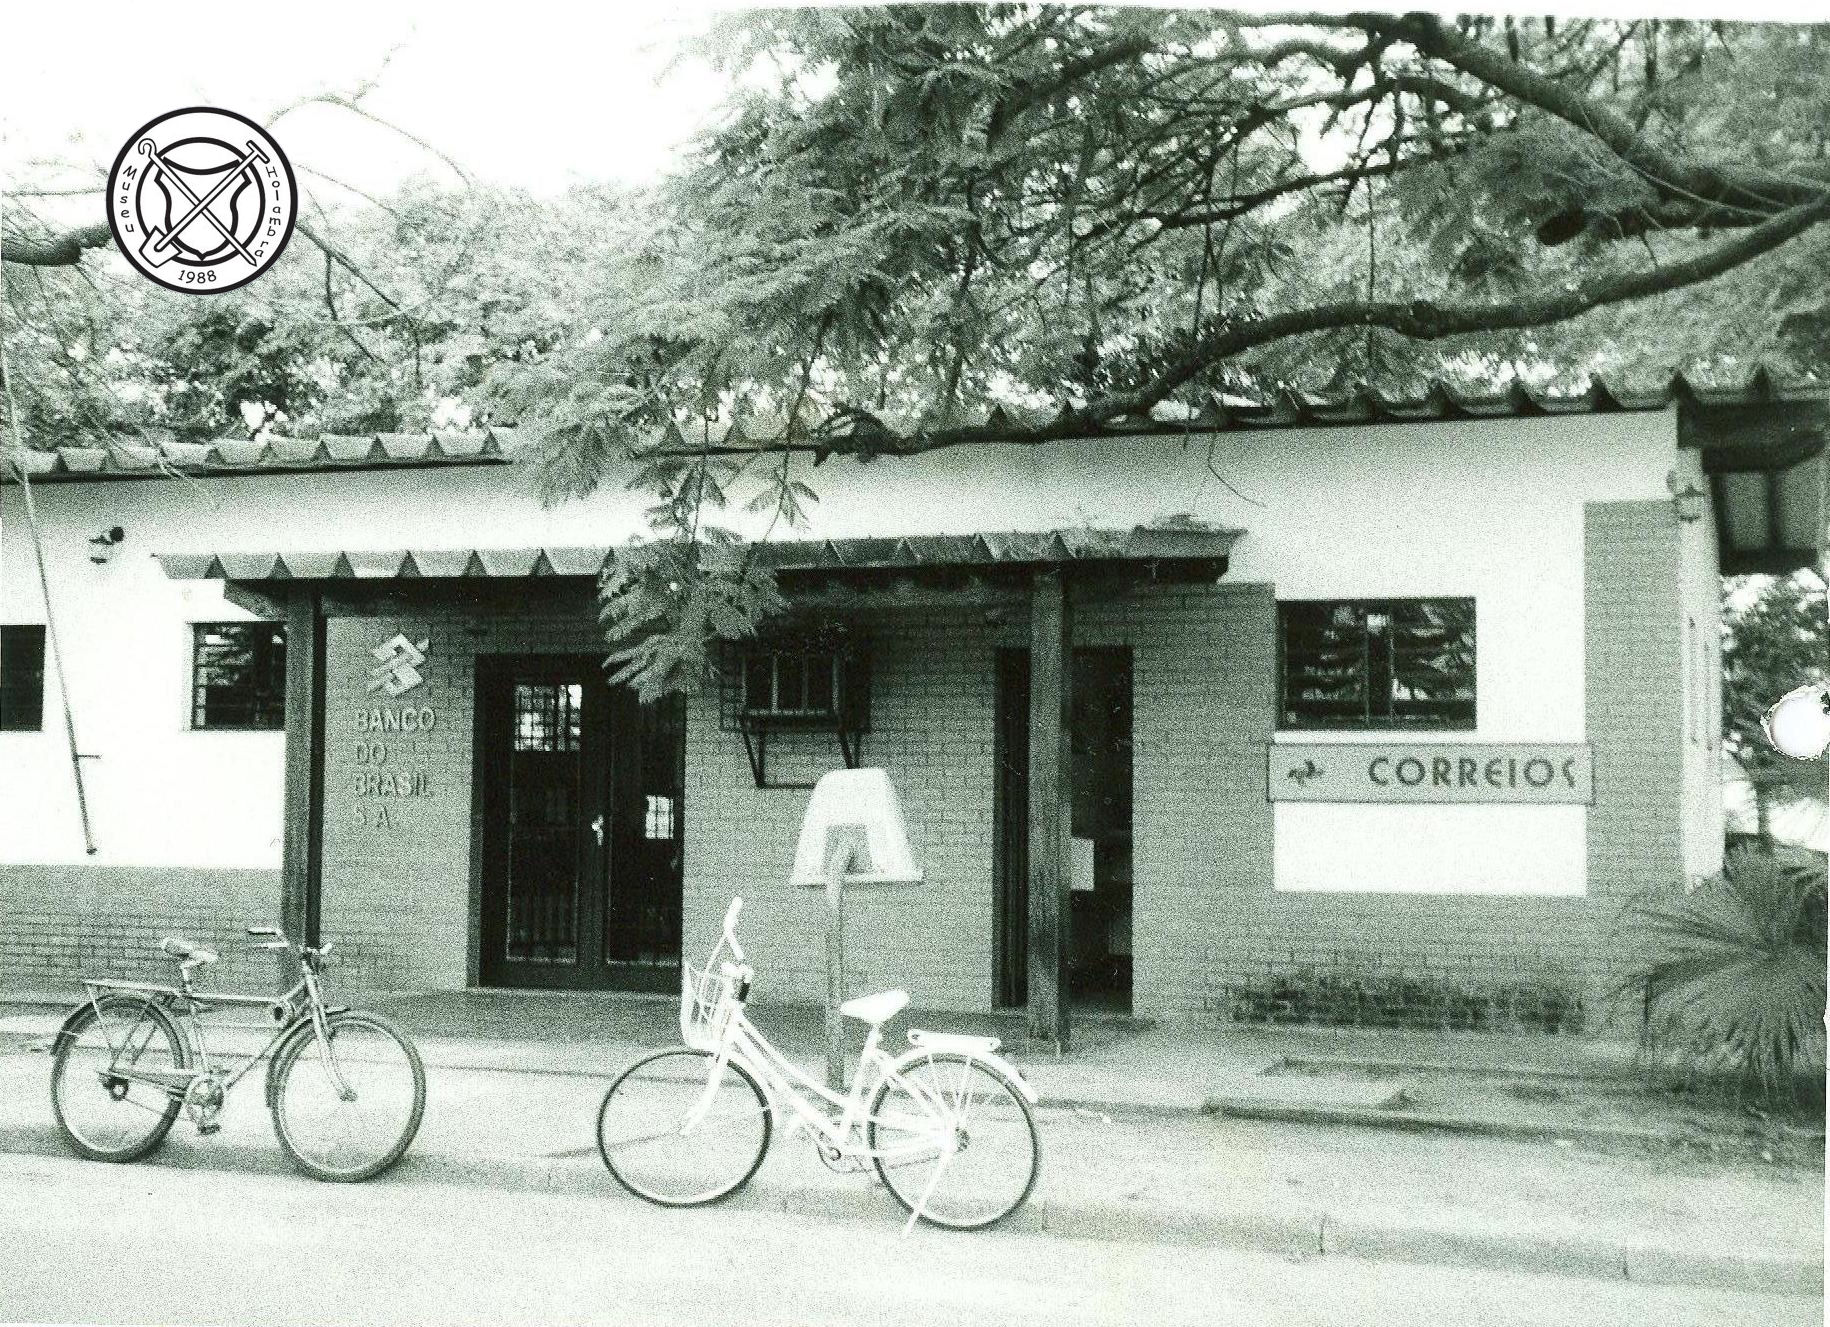 Banco do Brasil en postkantoor